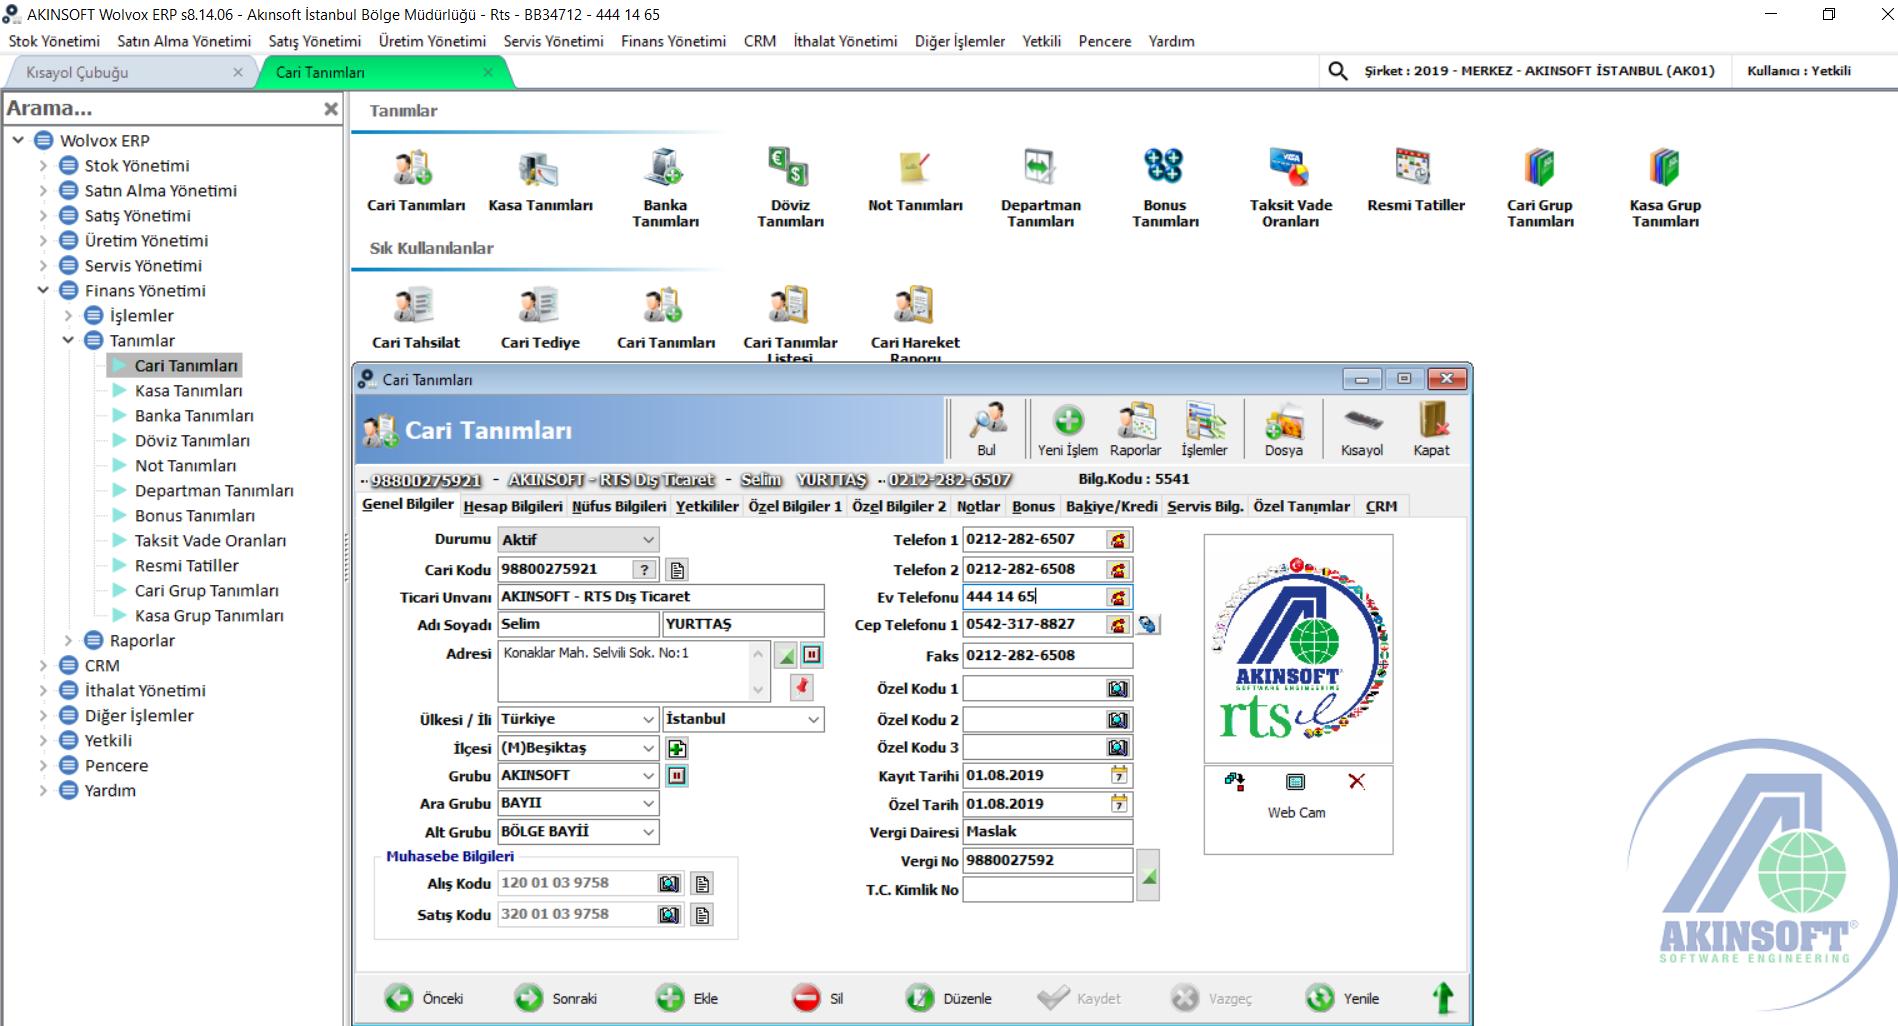 RTS Bilgisayar Akınsoft Wolvox ERP